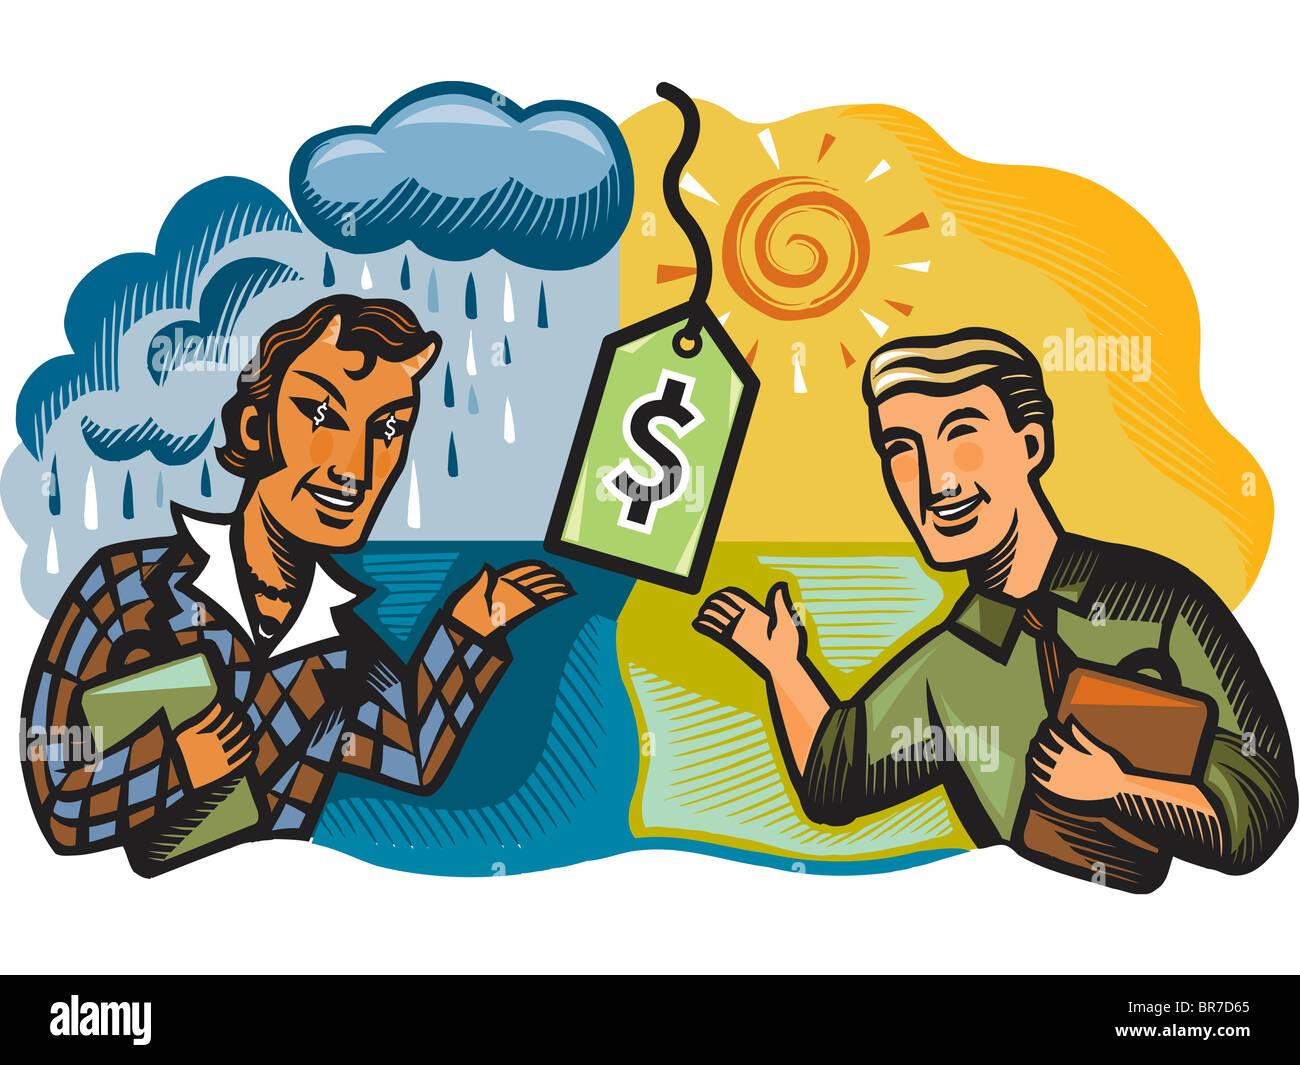 honest salesman and devil salesman - Stock Image